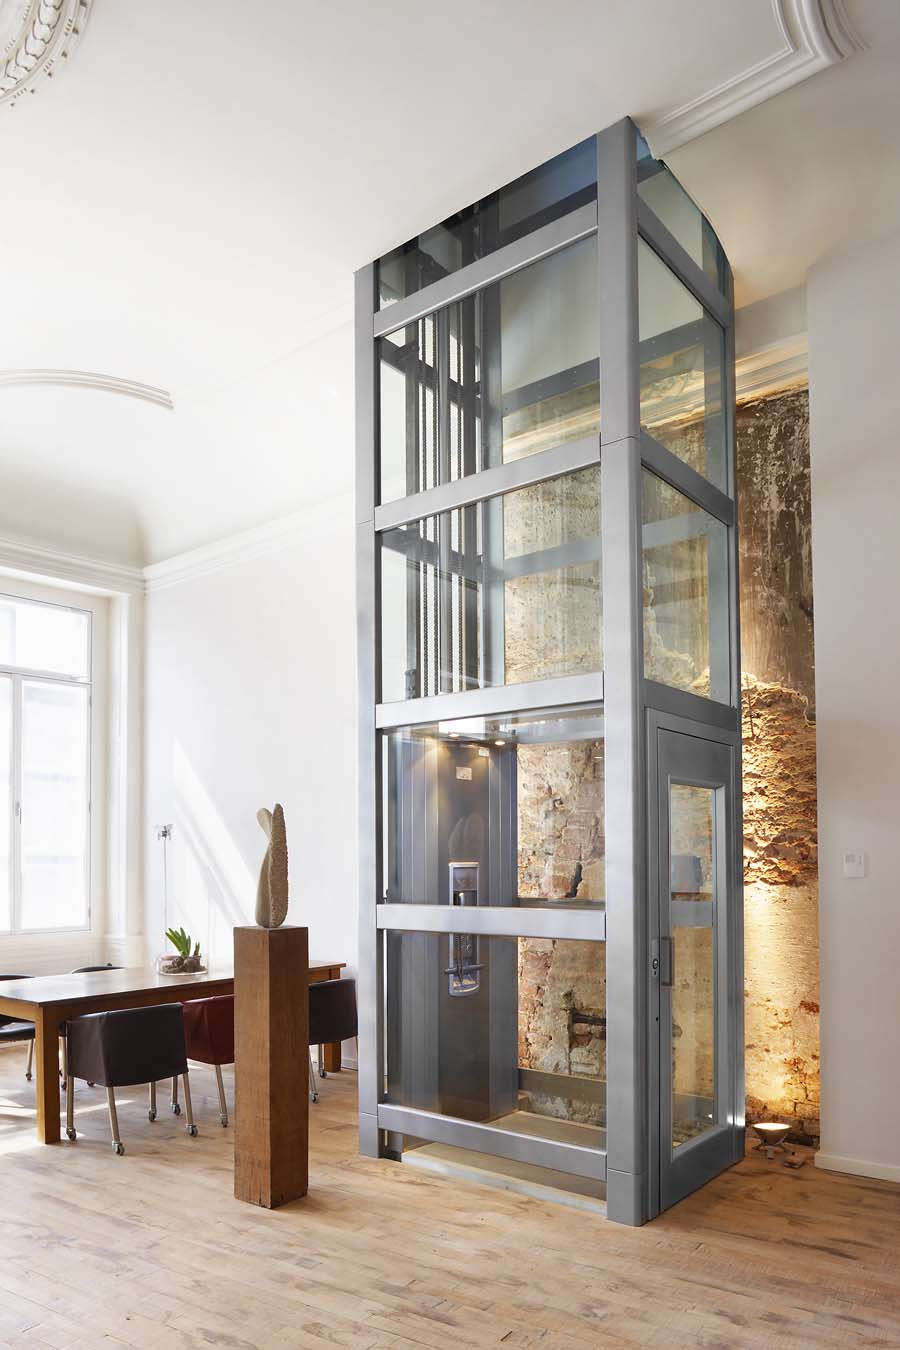 orian large elite elevators no 1 domestic home lifts